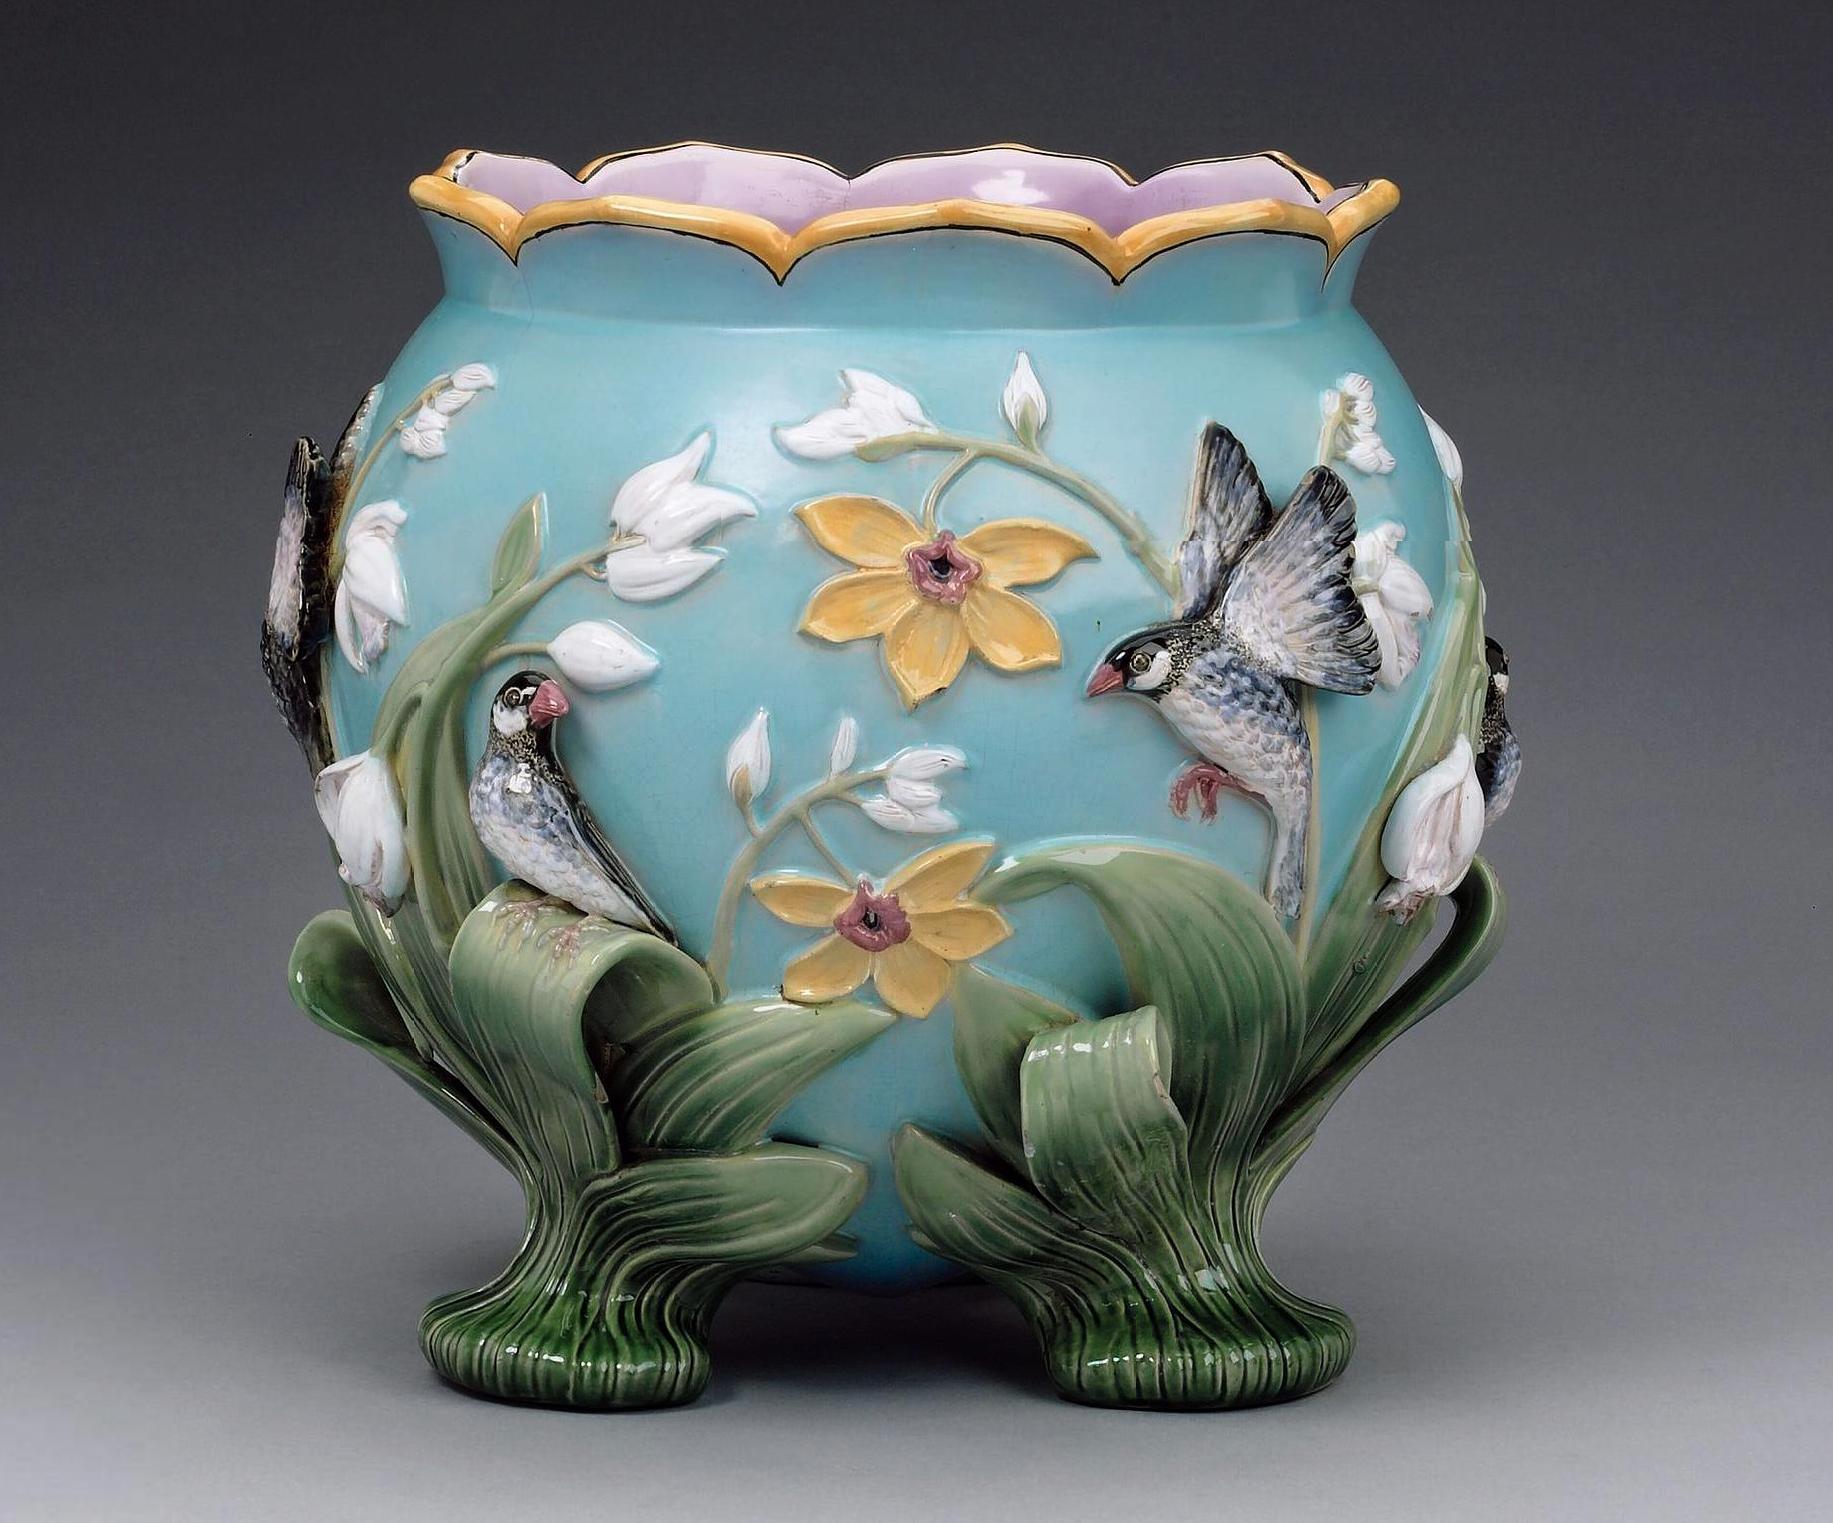 George jones majolica jardiniere cachepotsjardinieres vintage explore victorian vases pedestal stand and more reviewsmspy